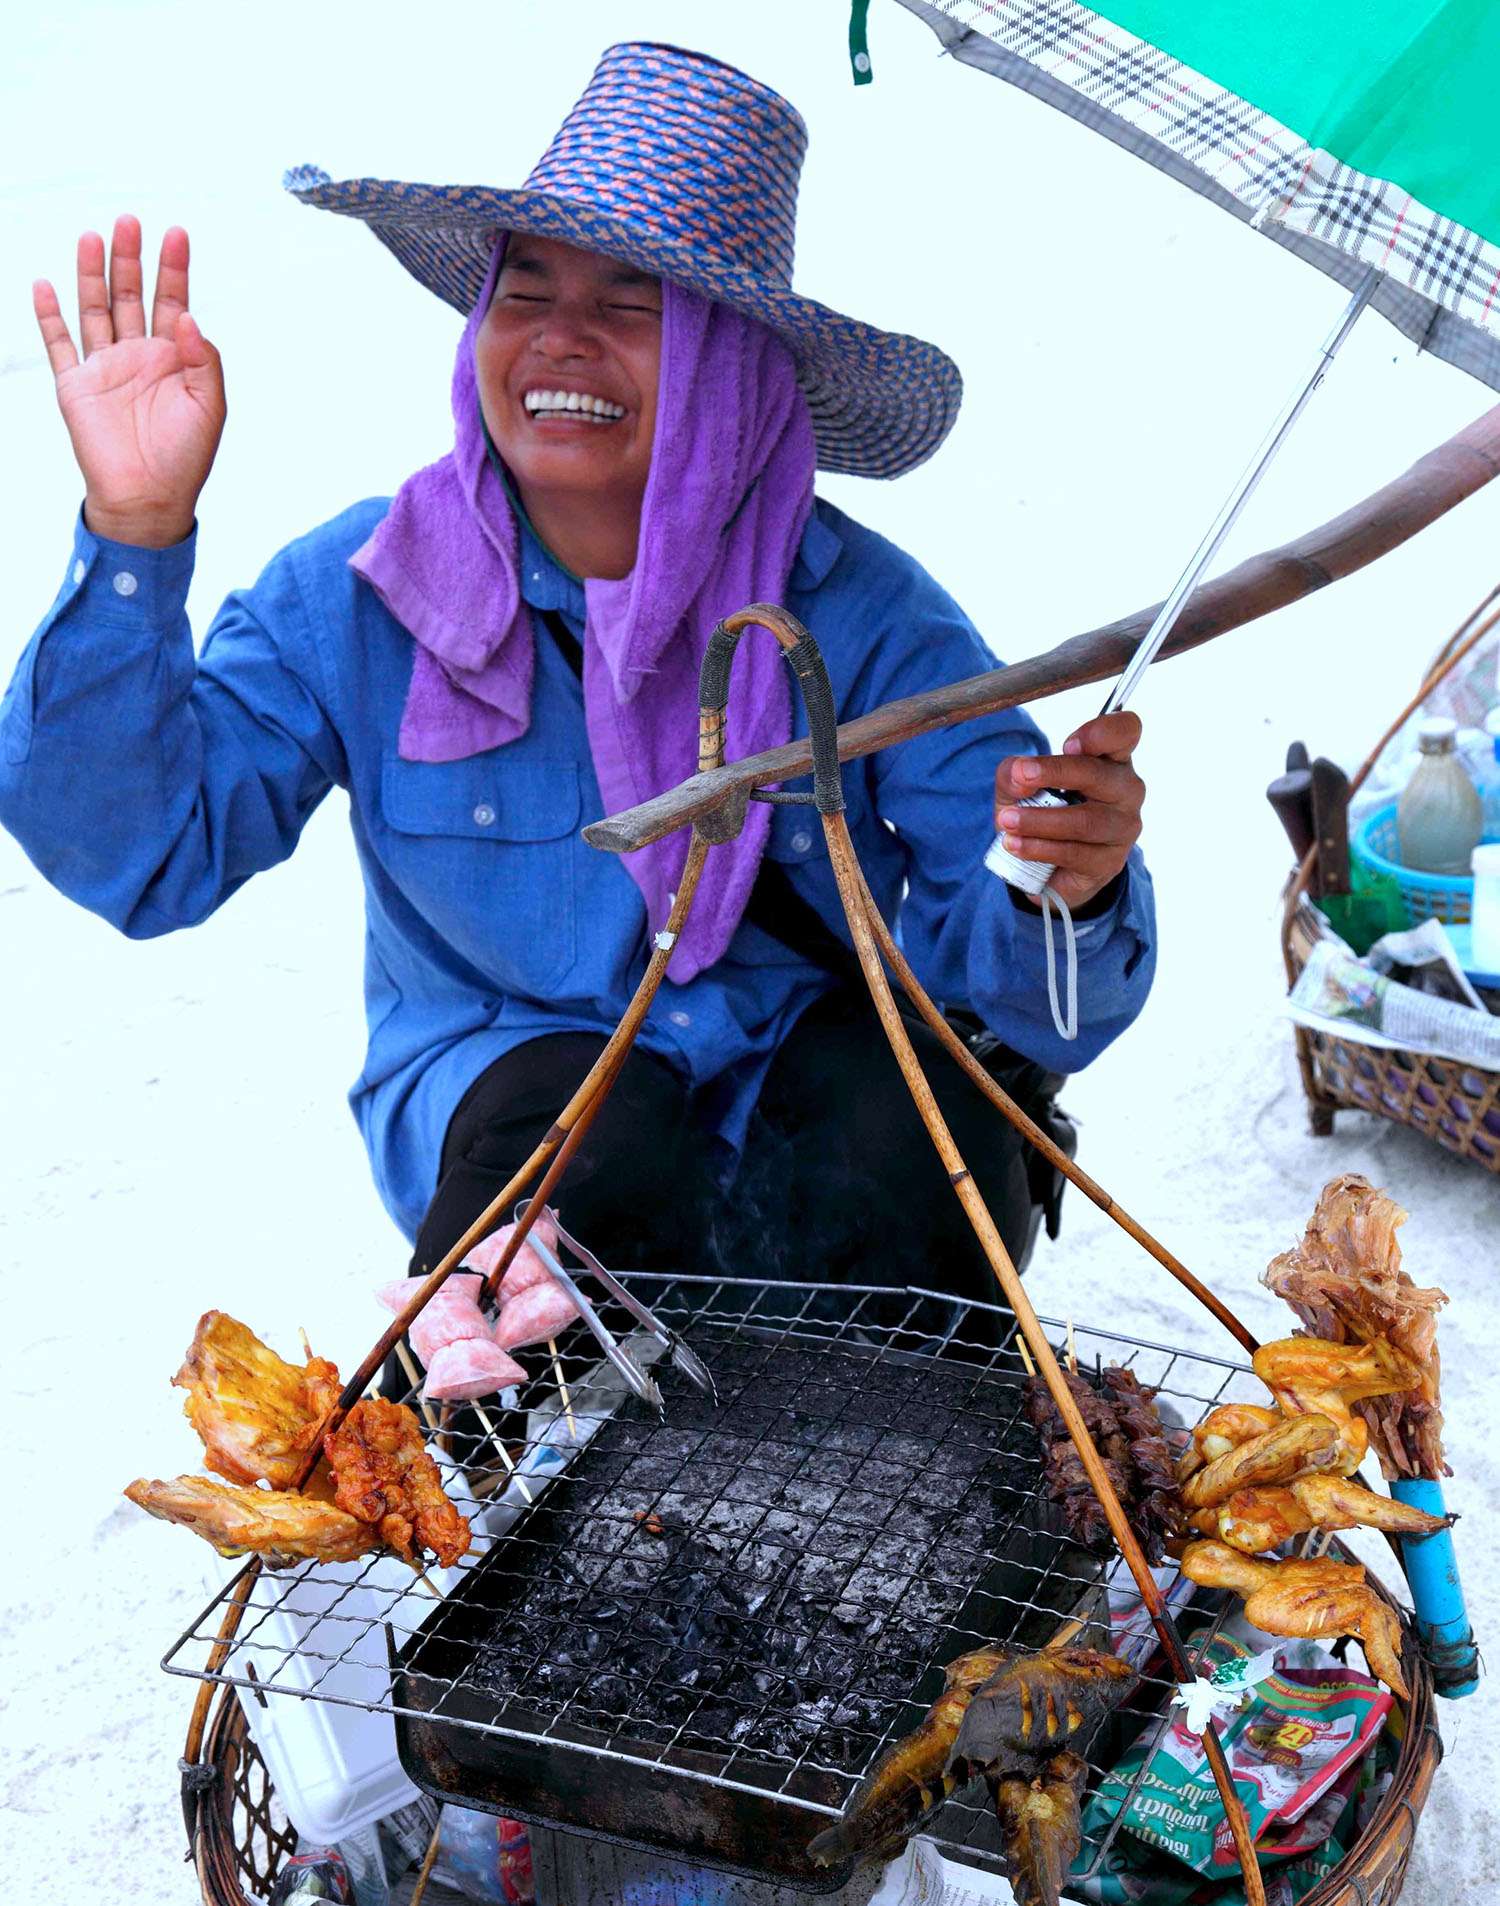 Thai woman, beach vendor, selling fried chicken.